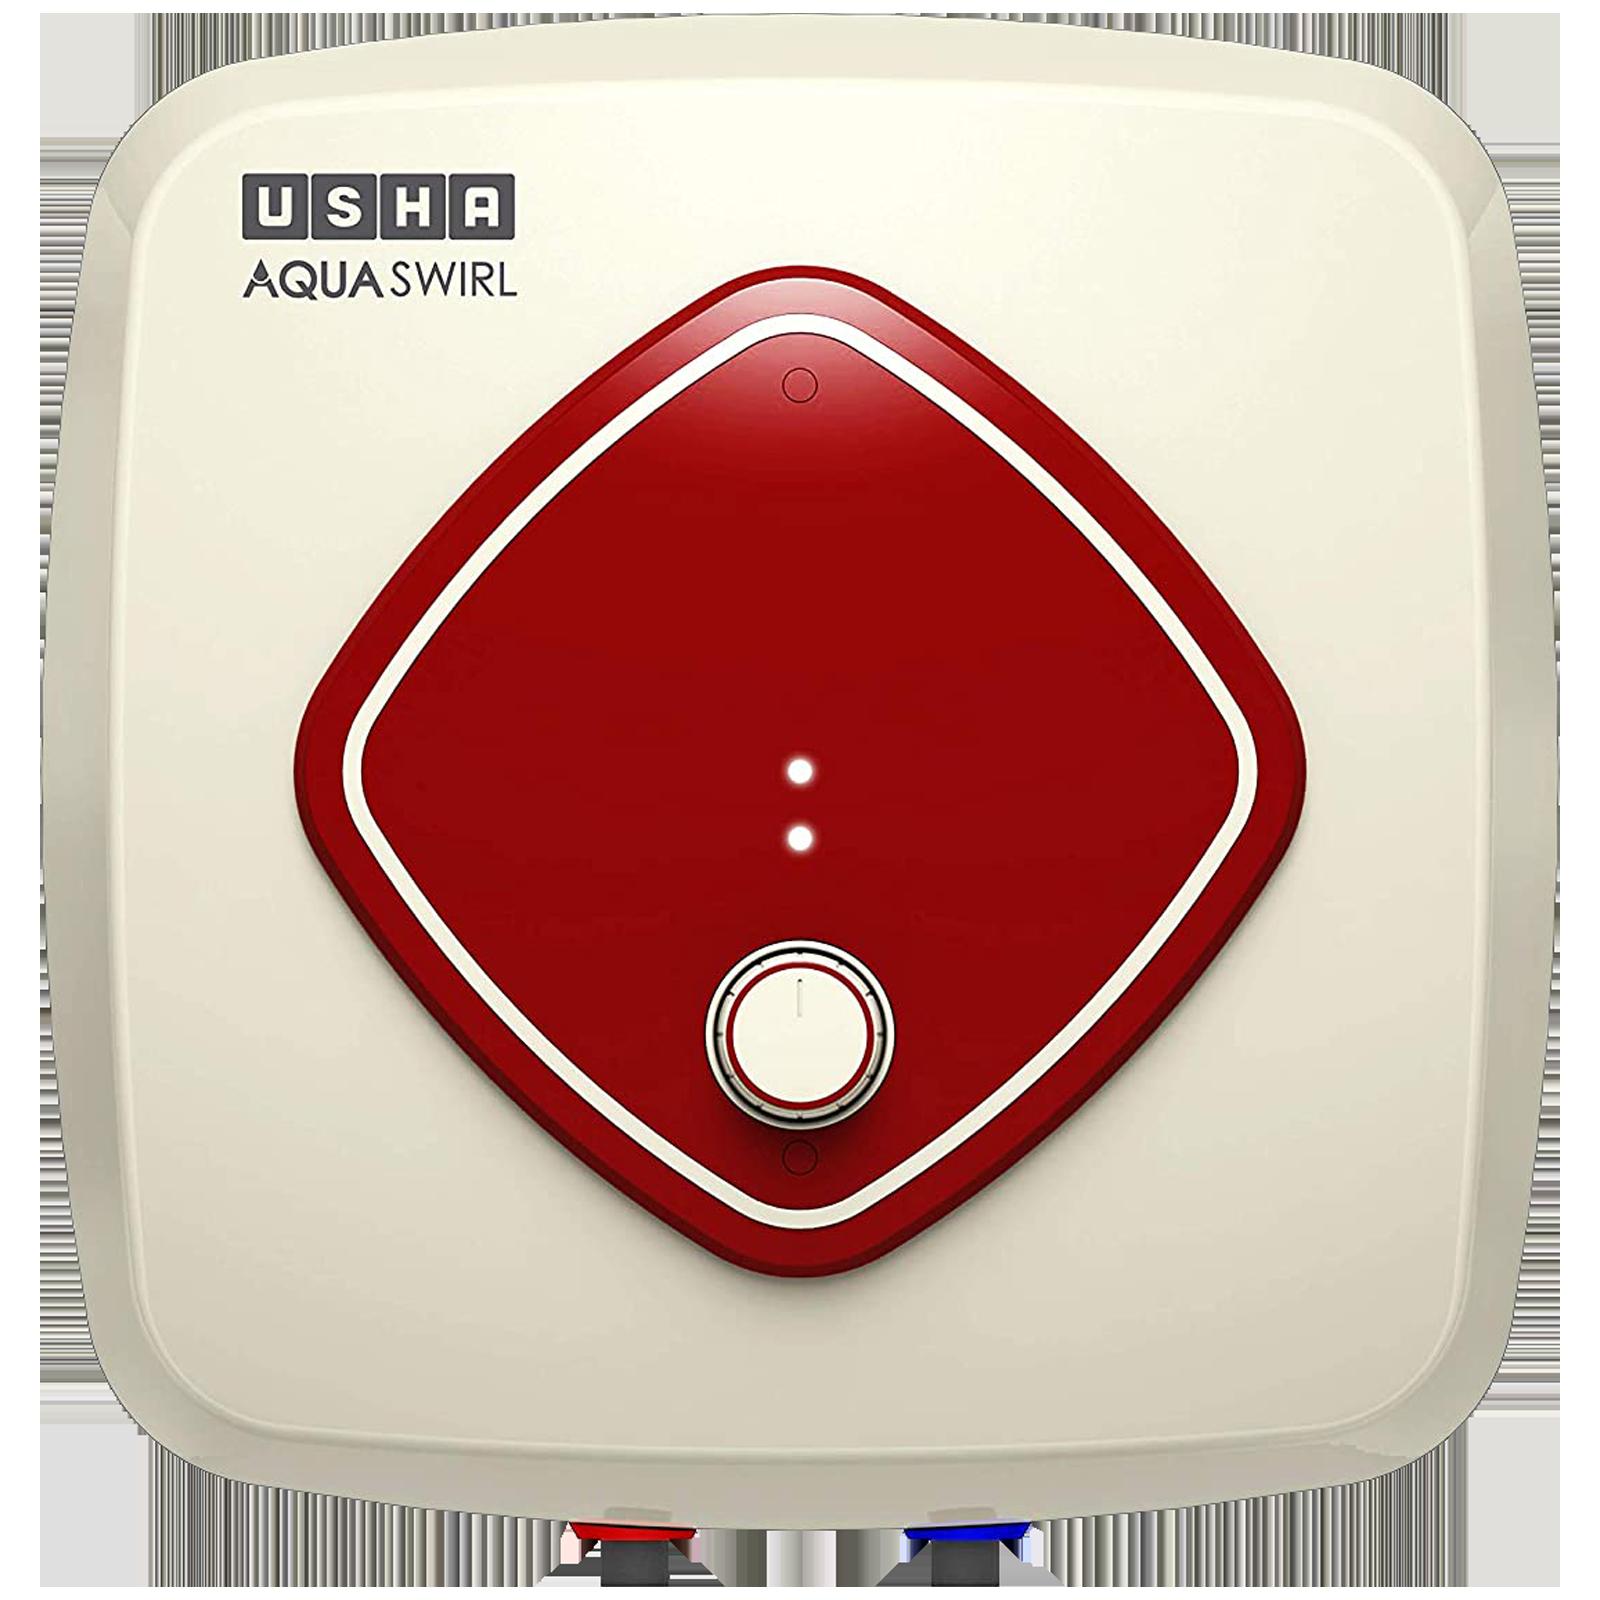 Usha Aqua Swirl 25 Litres 5 Star Storage Water Geyser (2000 Watts, 4687AS25AX159N, Ivory Wine)_1